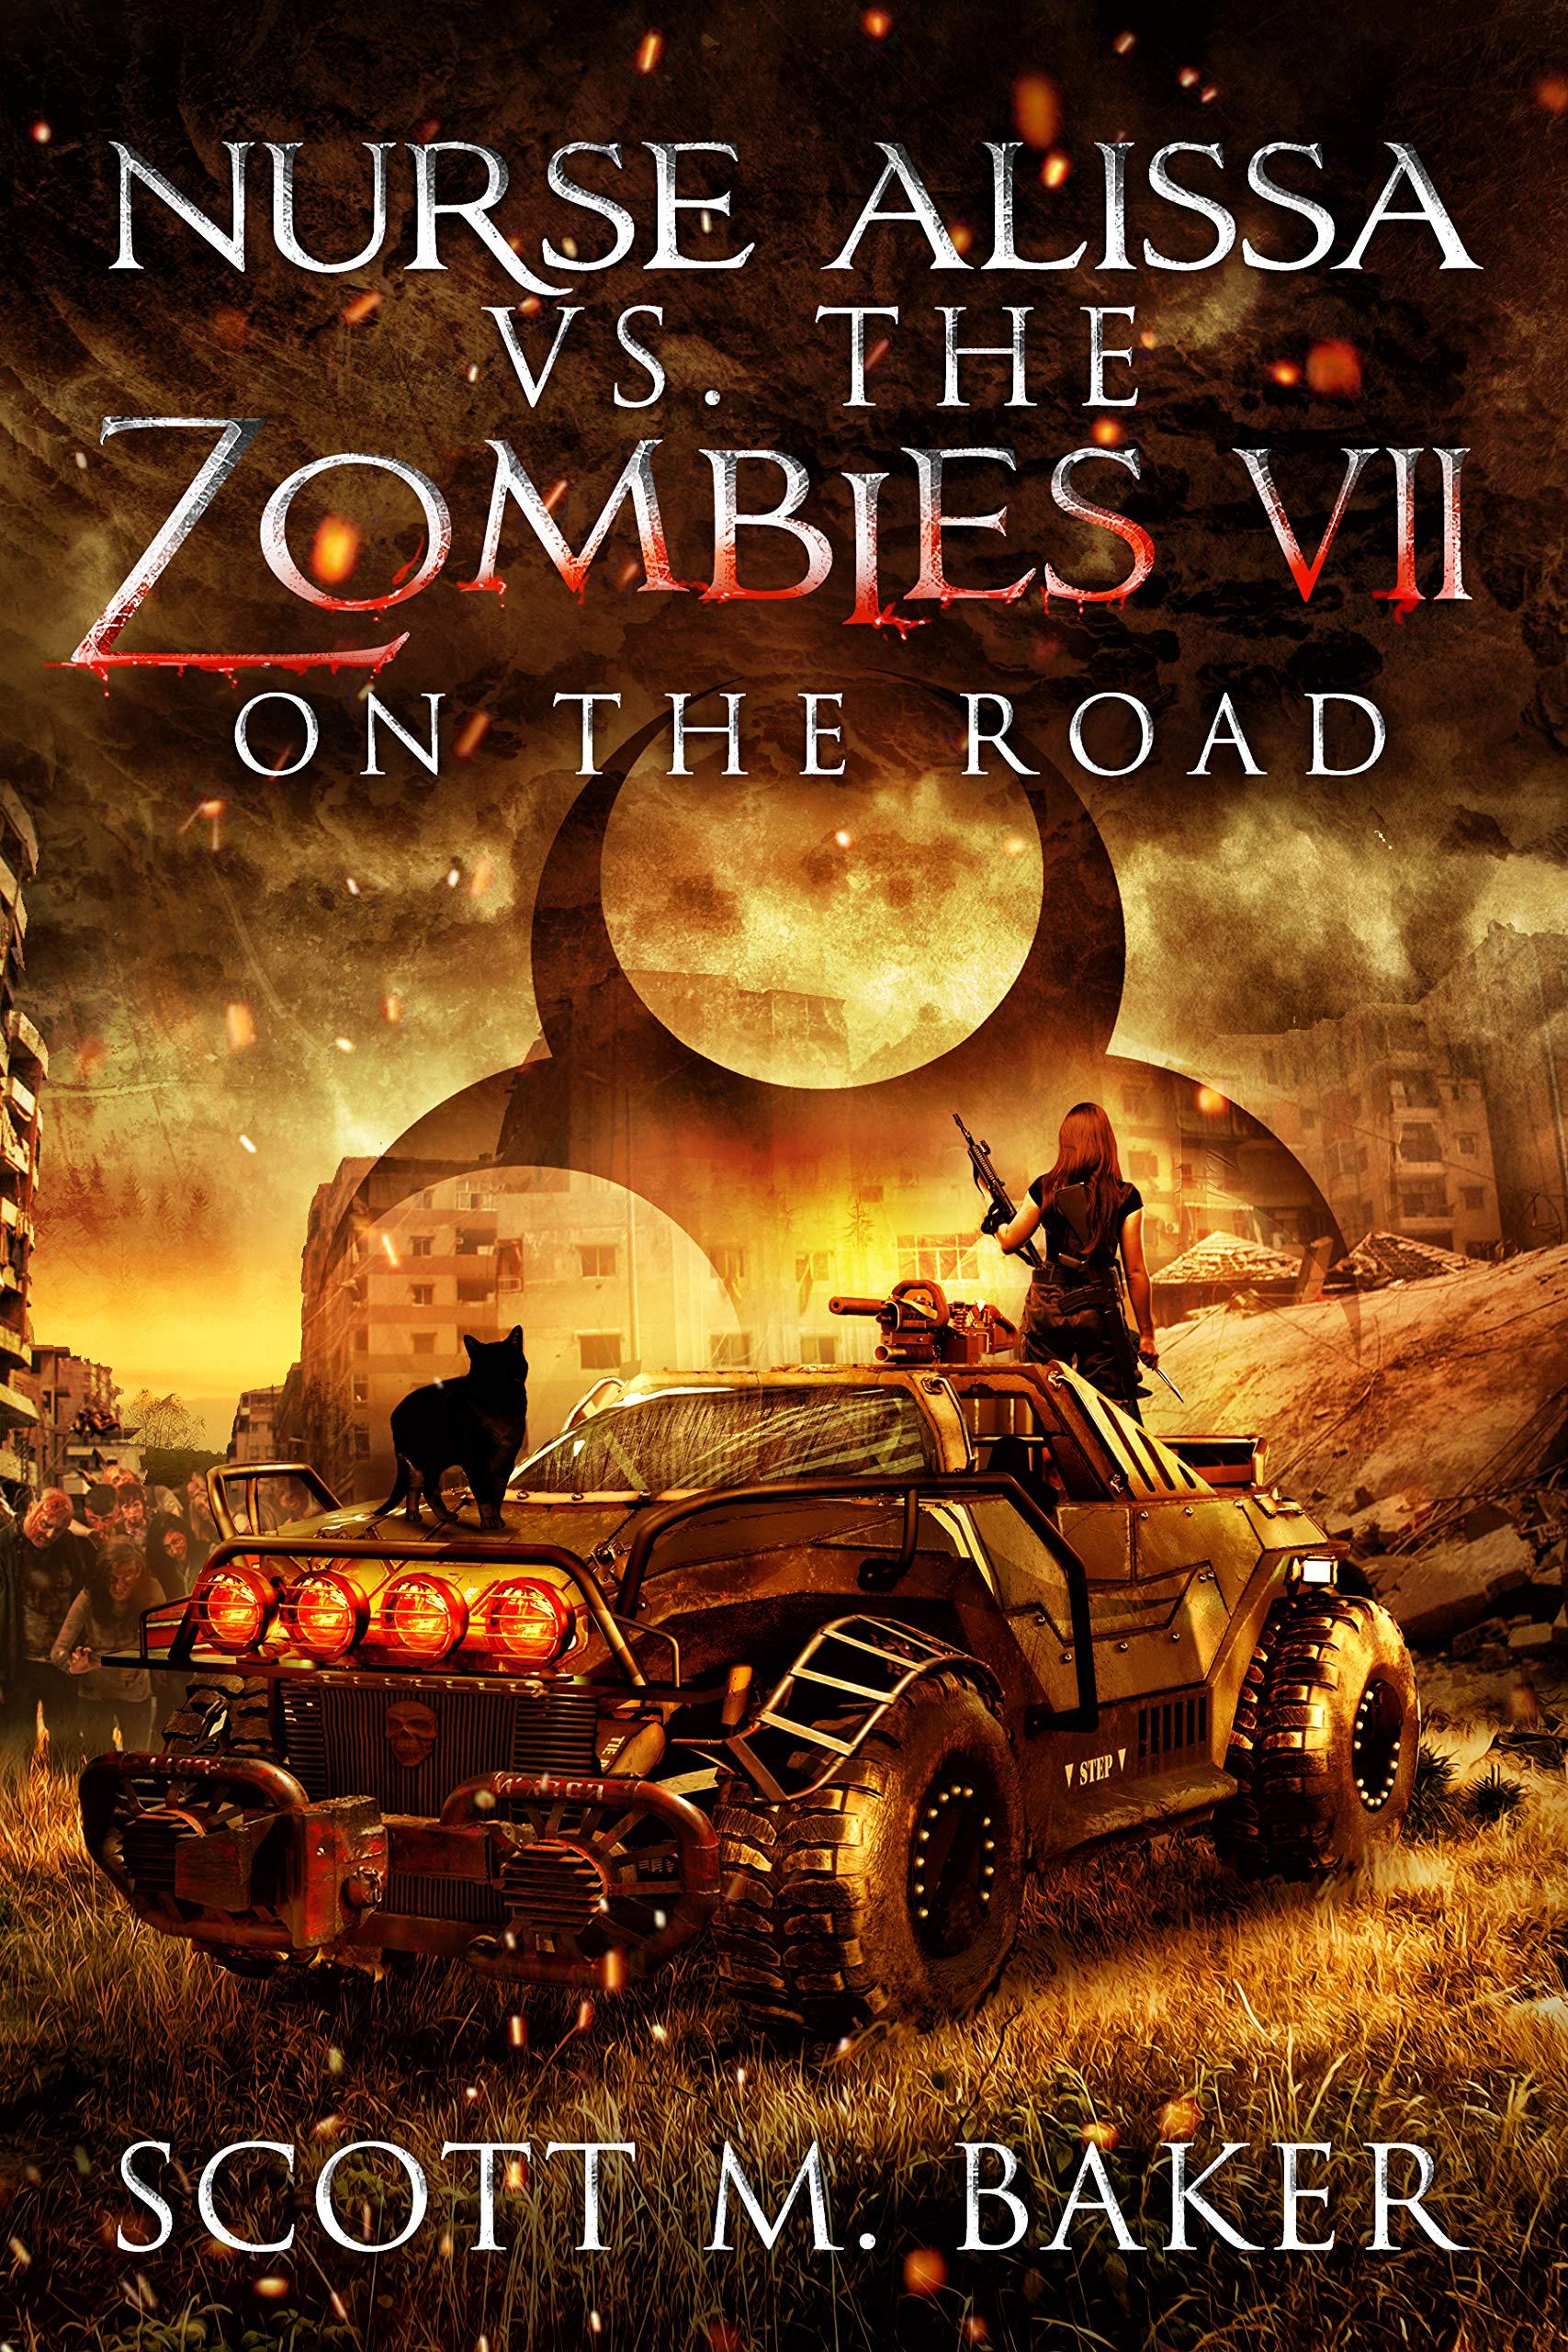 Nurse Alissa vs. the Zombies VII:: On the Road